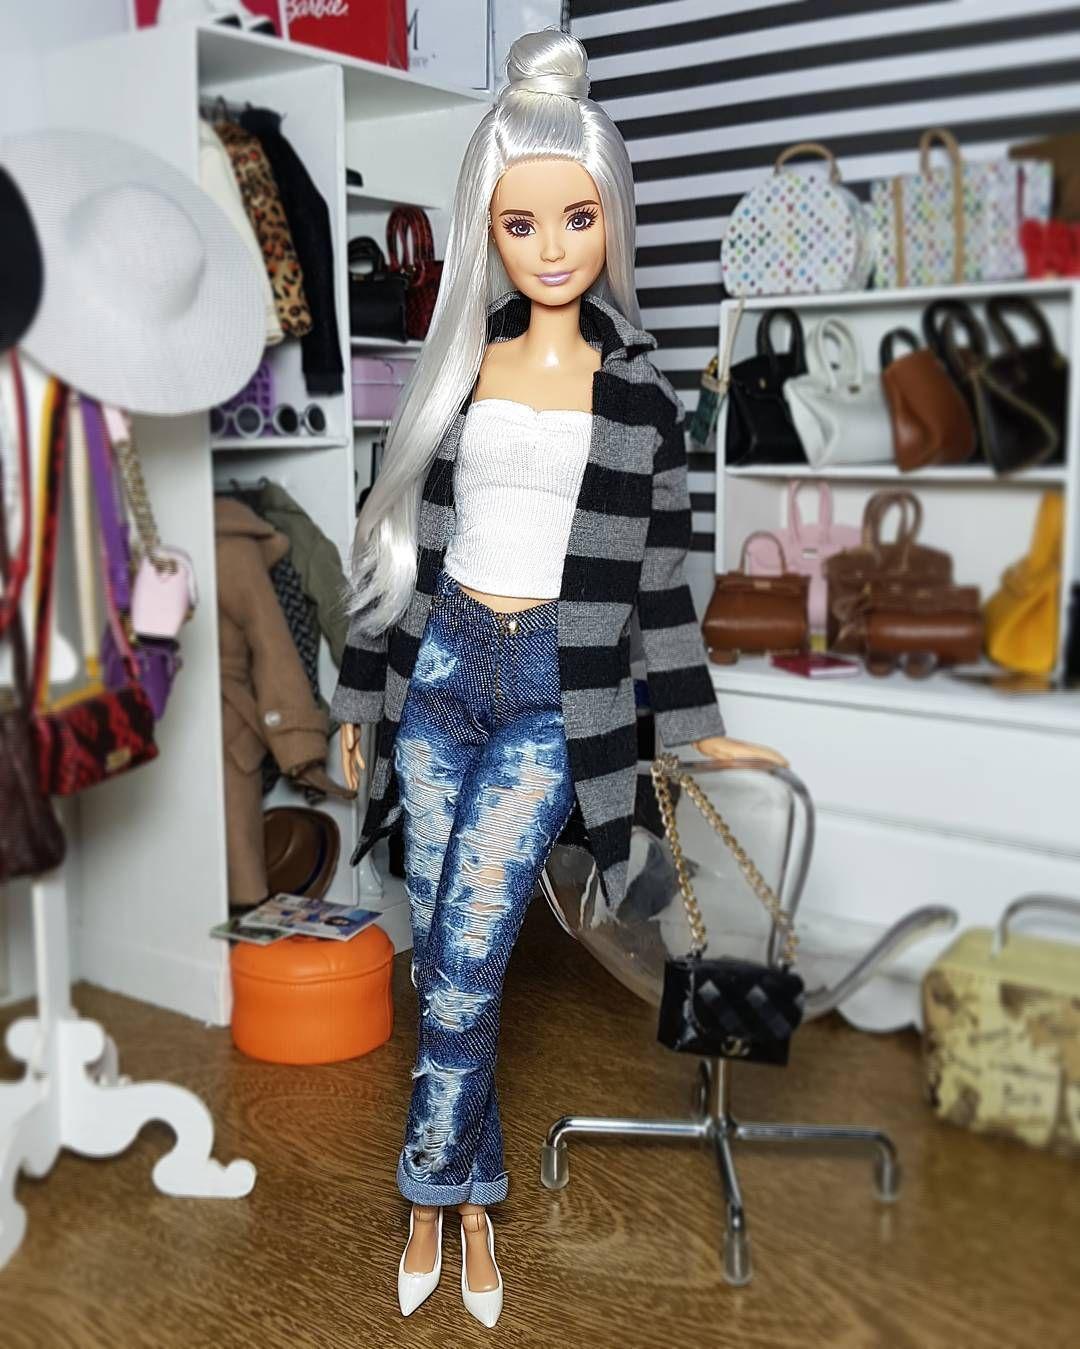 2,031 Gostos, 24 Comentários - Barbieswall (@barbieswall) no Instagram: look do dia! #Barbie #BarbieStyle #BarbieCollection #BarbieCollector #Doll #Dolls… #barbiefurniture